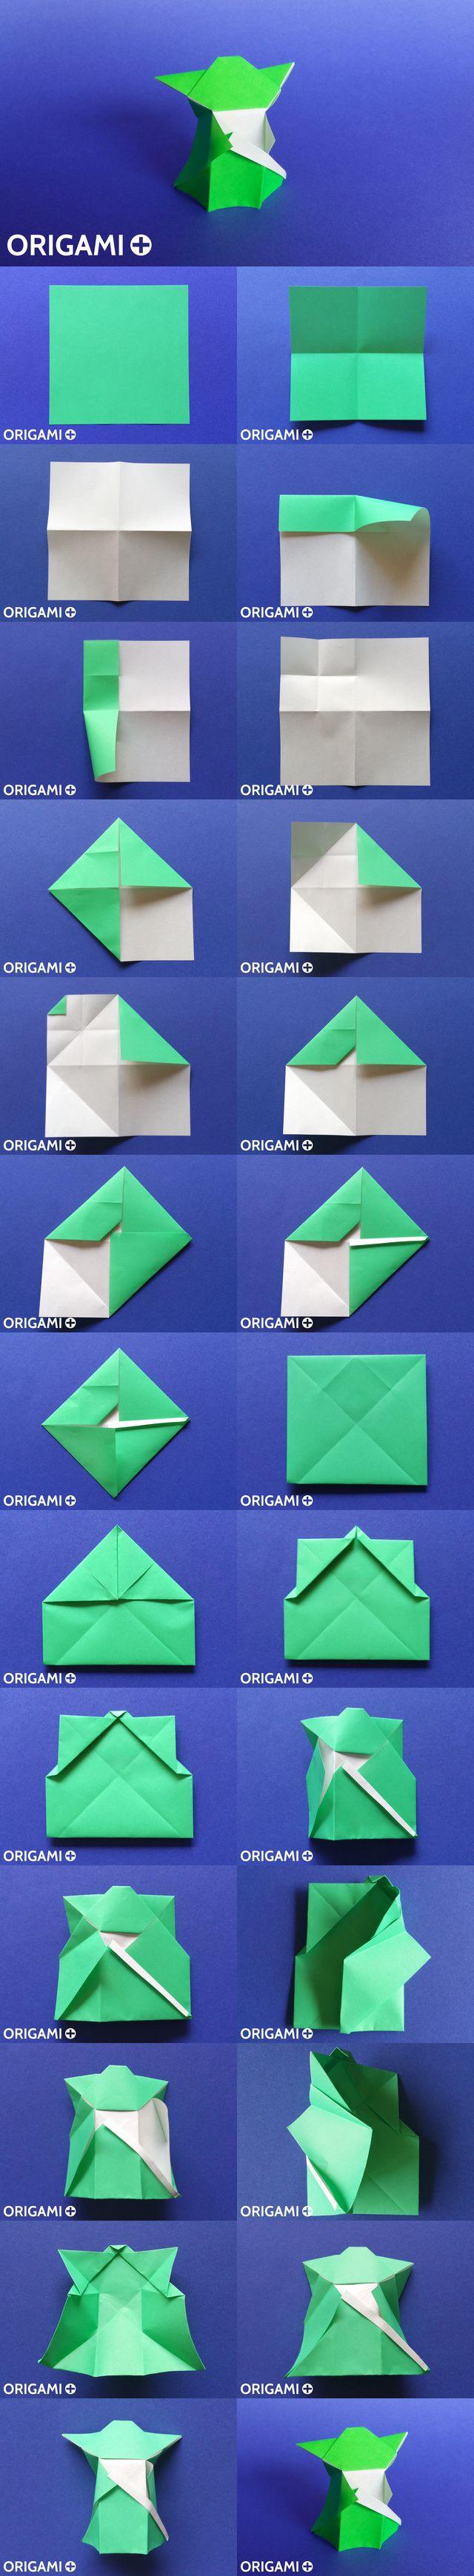 Origami Yoda tutorial. Star Wars origami.                                                                                                                                                     More